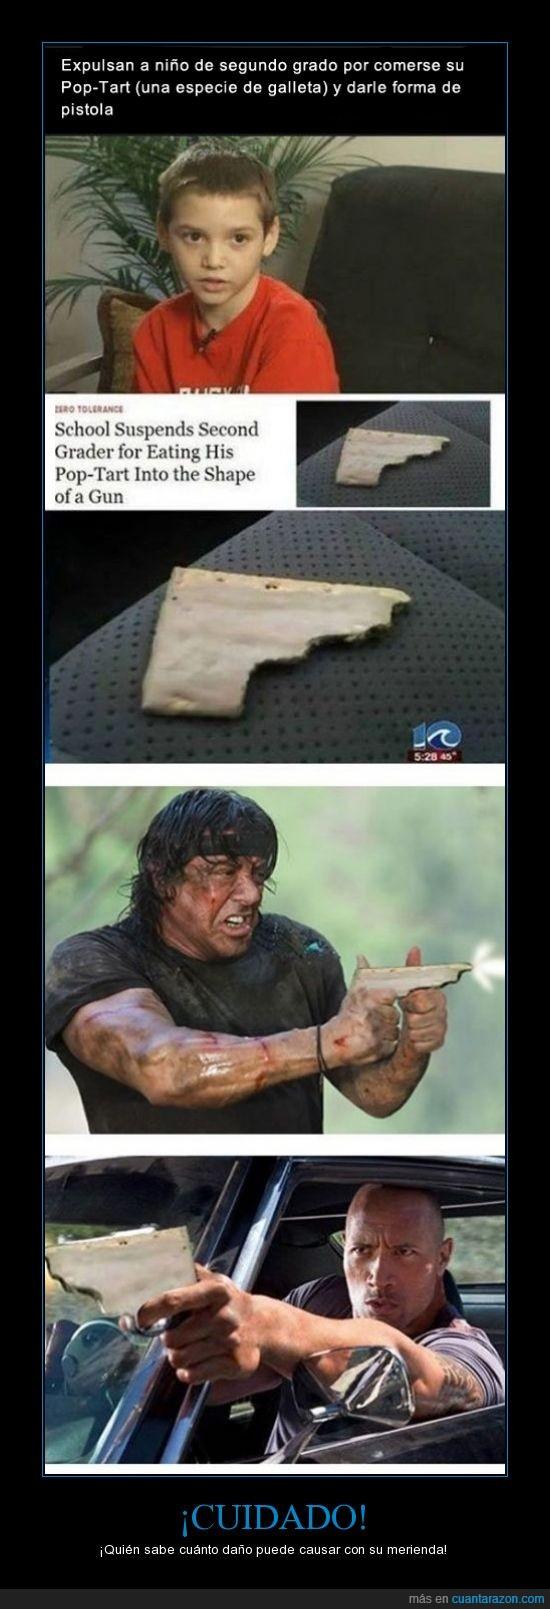 expulsar,forma,galleta,matar,merienda,morder,niño,pistola,pop-tart,poptart